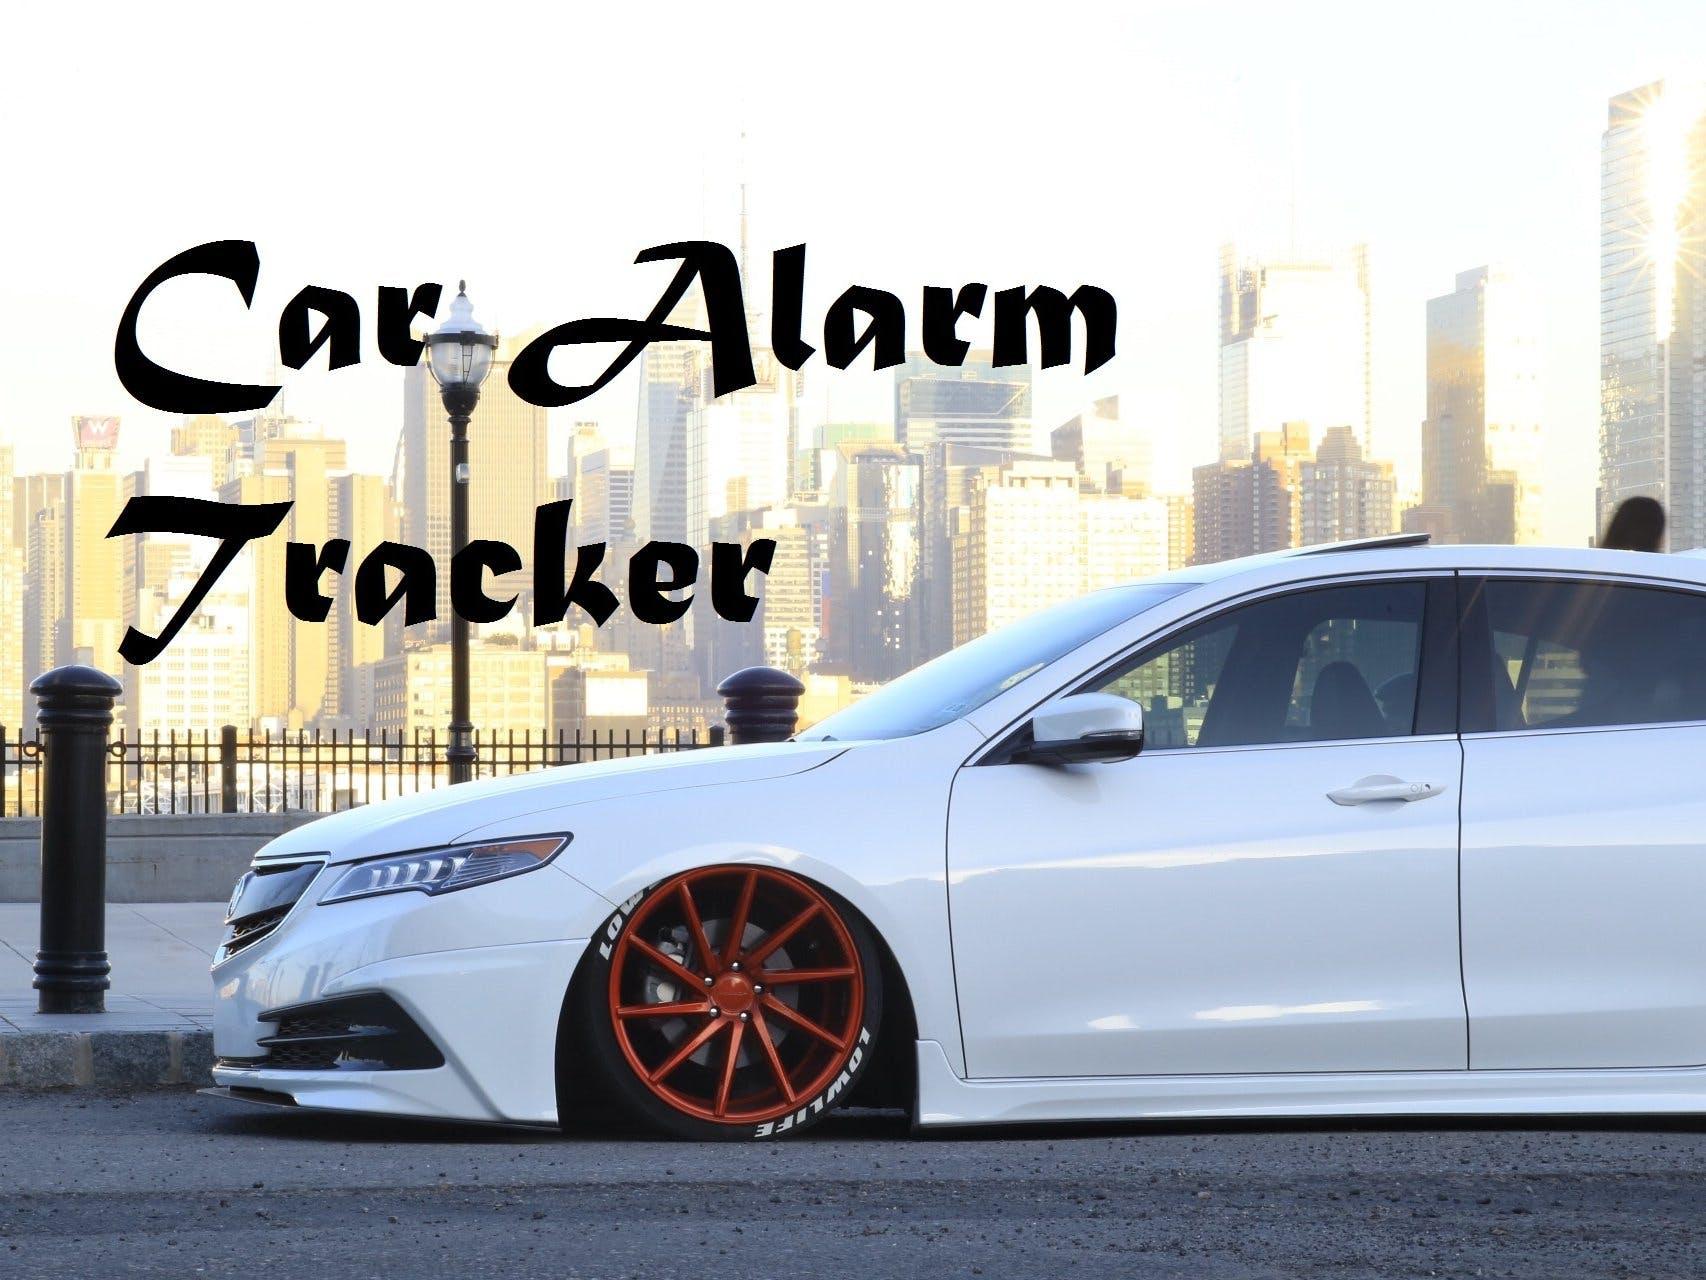 Car Alarm Tracker